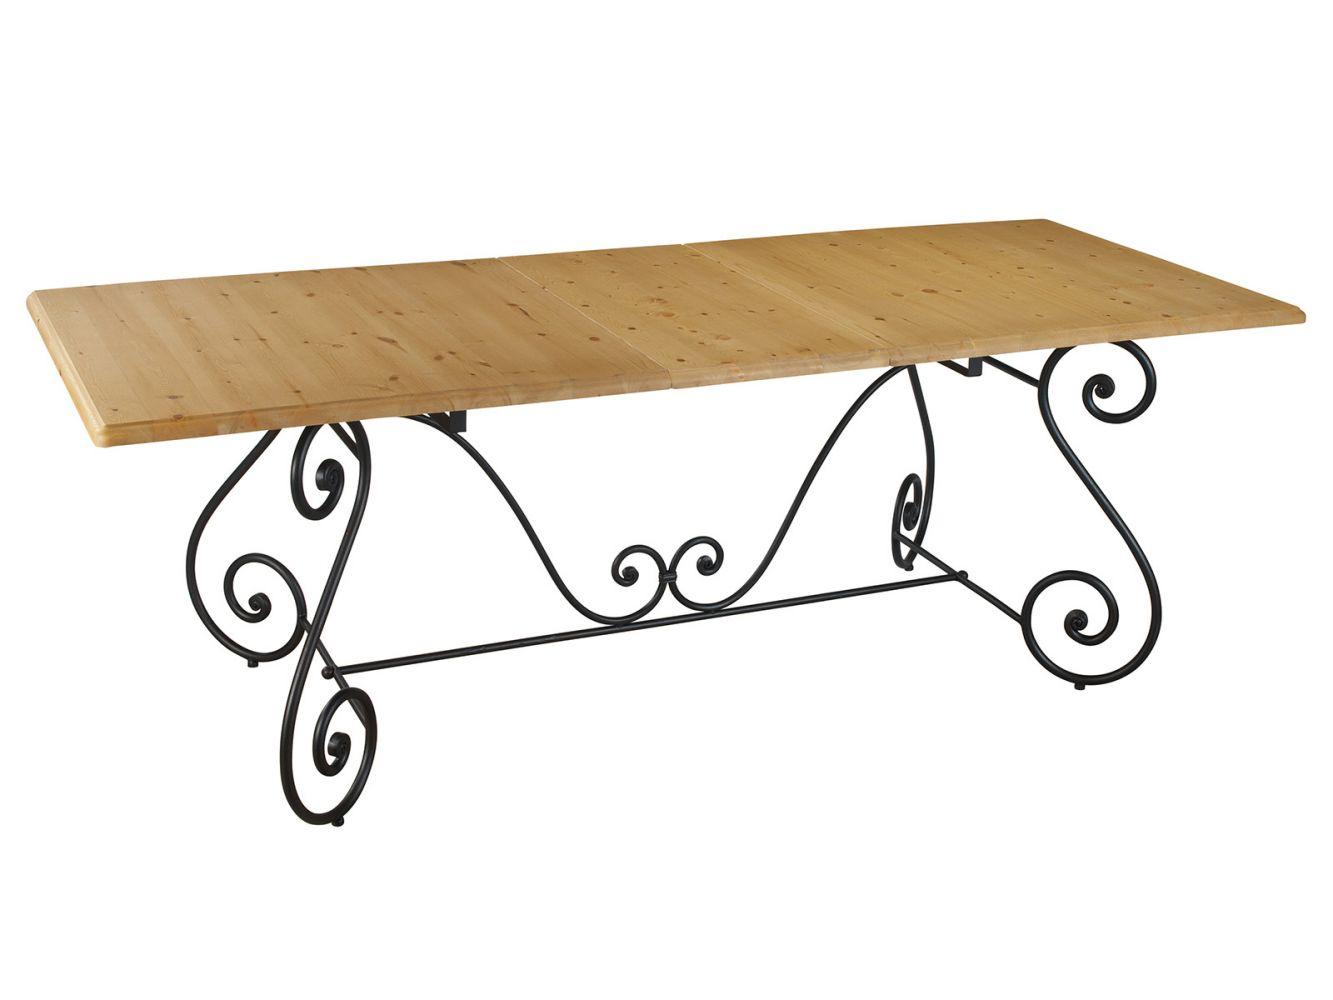 Table en fer forg pour salle manger meuble et d coration marseille mob - Table salle a manger en fer forge ...